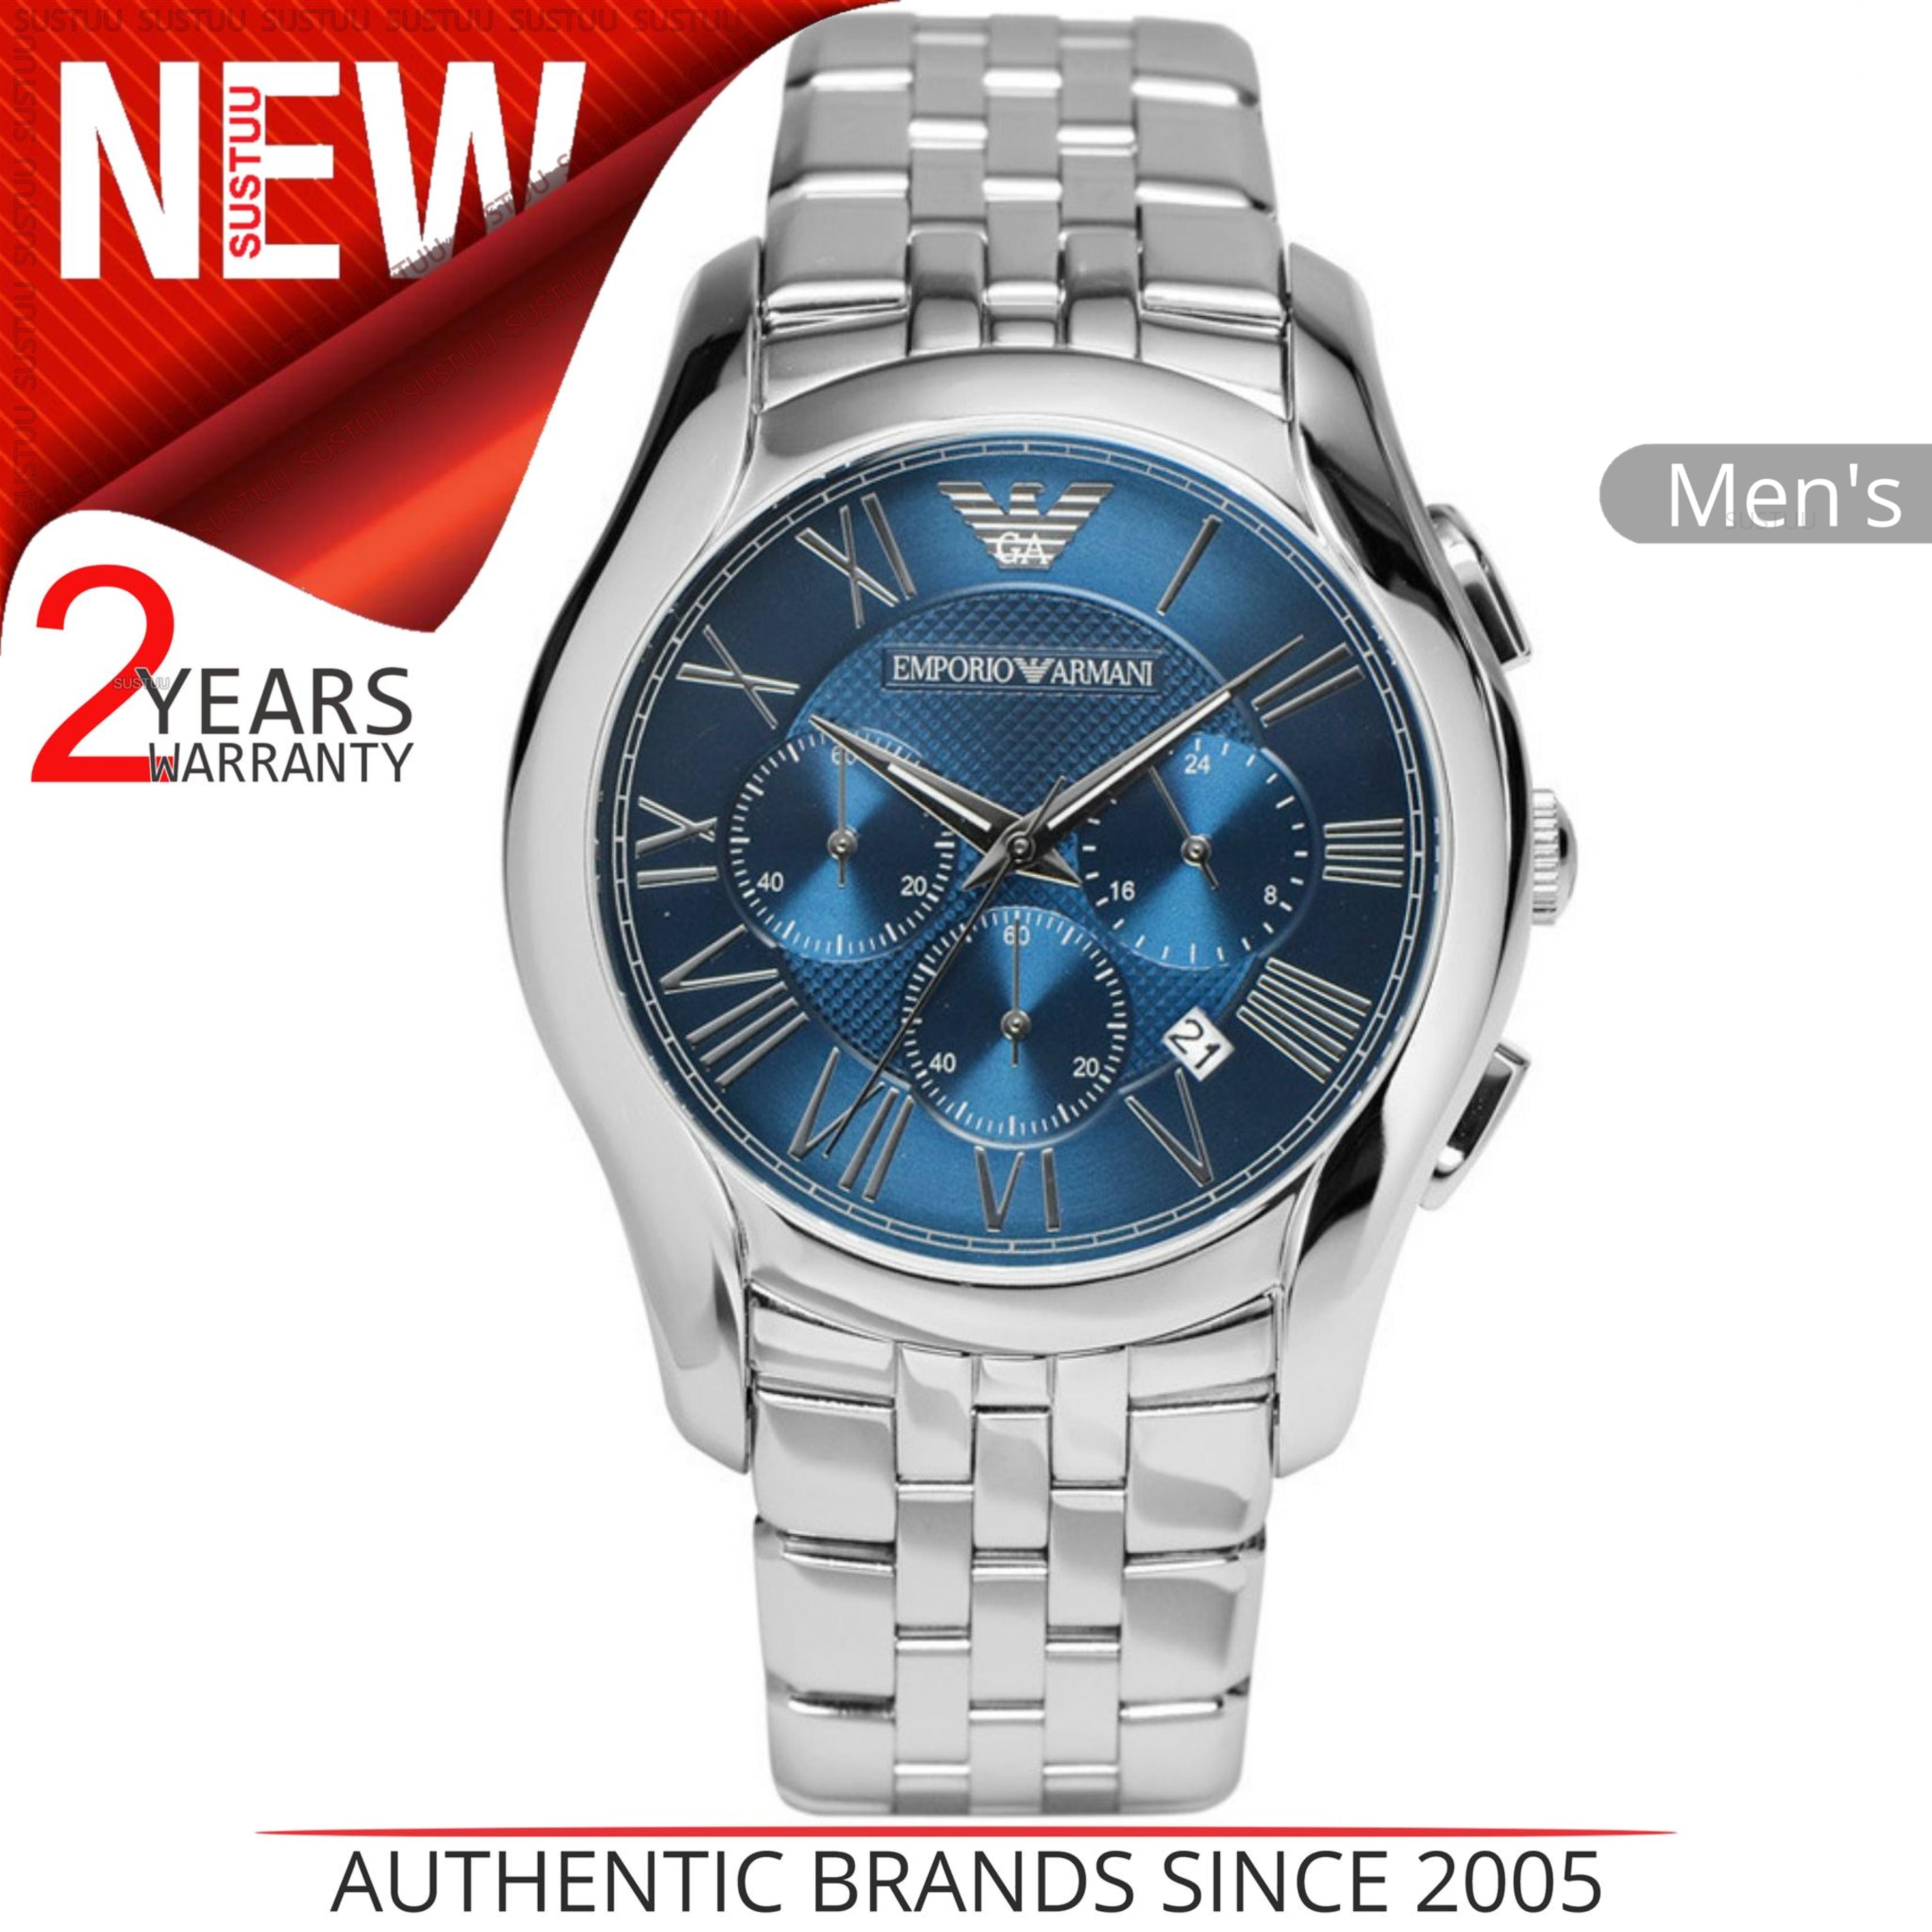 fb2f6e9de6d Details about Emporio Armani Classic Men s Watch│Chronograph Navy Blue Dial │Stainelss│AR1787